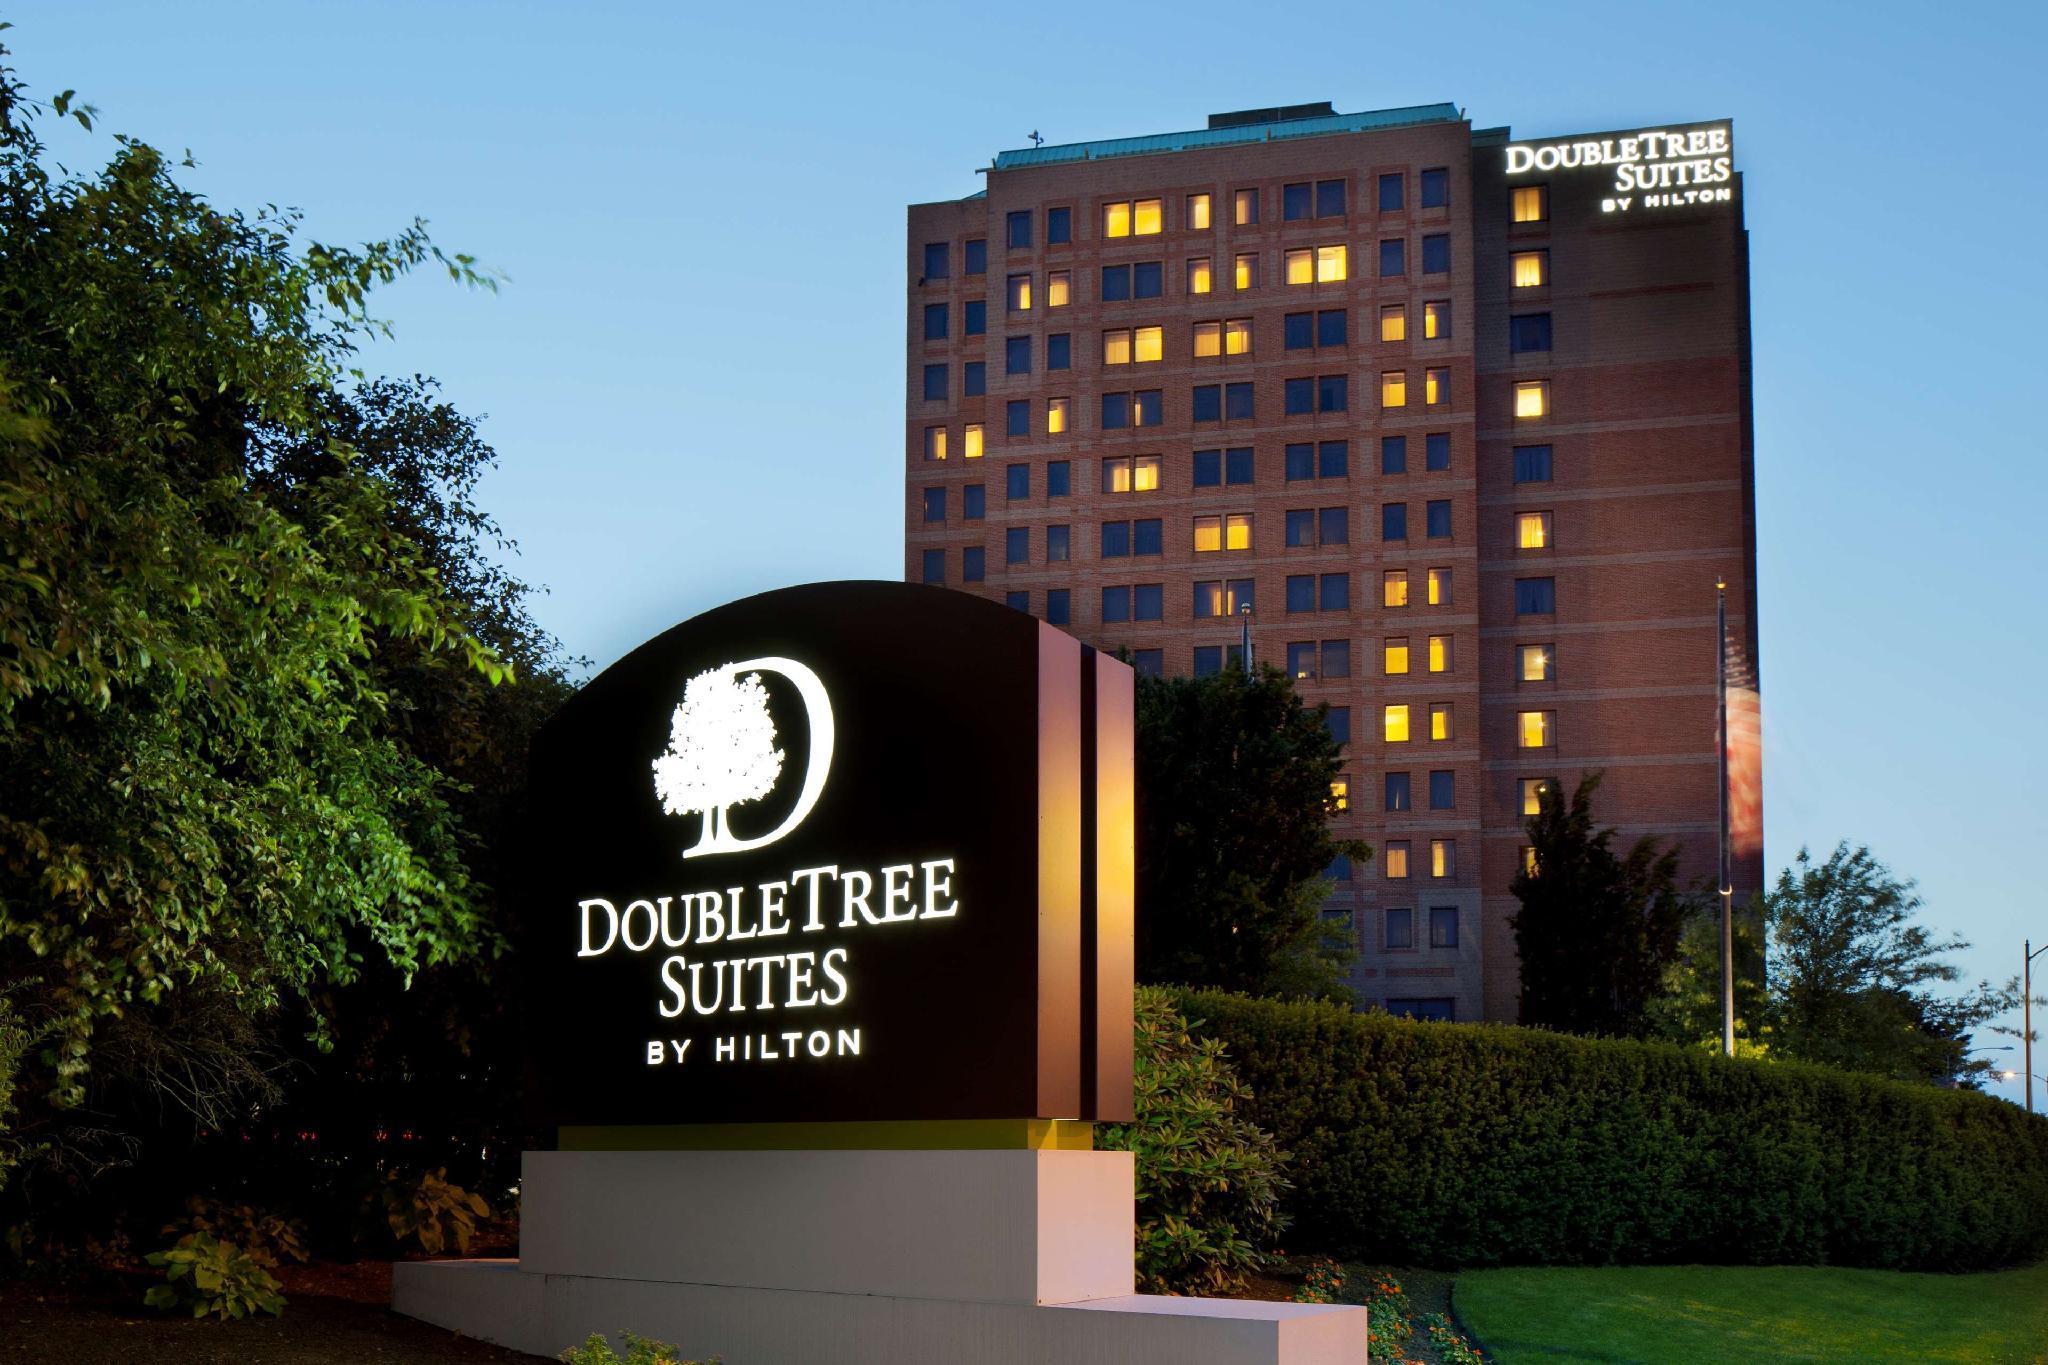 DoubleTree Suites by Hilton Hotel Boston – Cambridge image